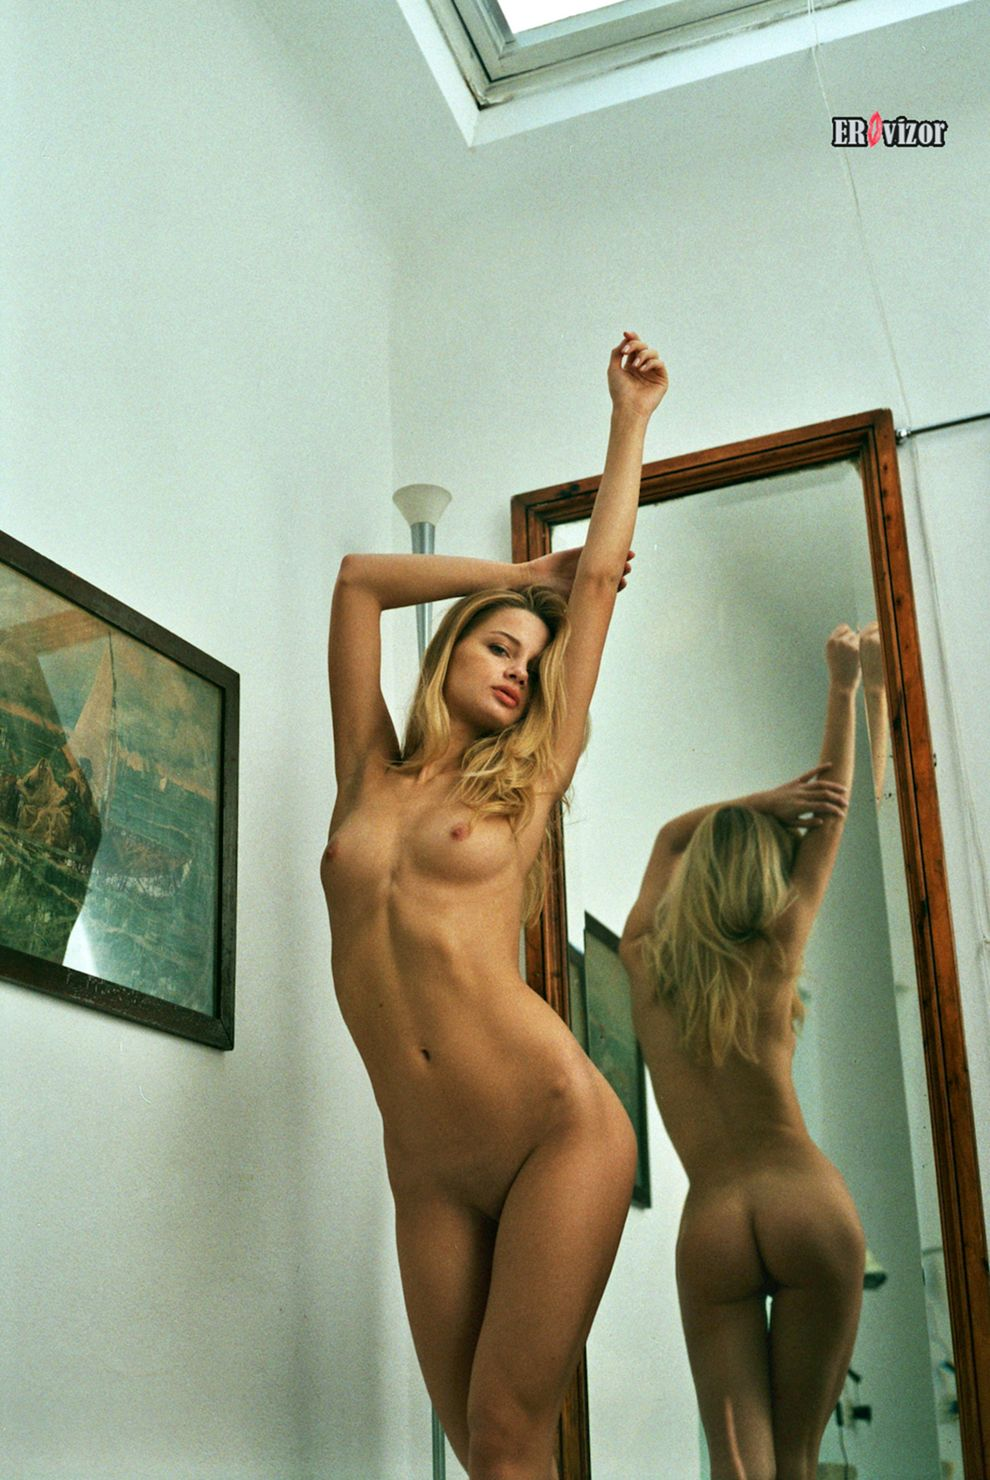 legkaya_erotica-erovizor (19)